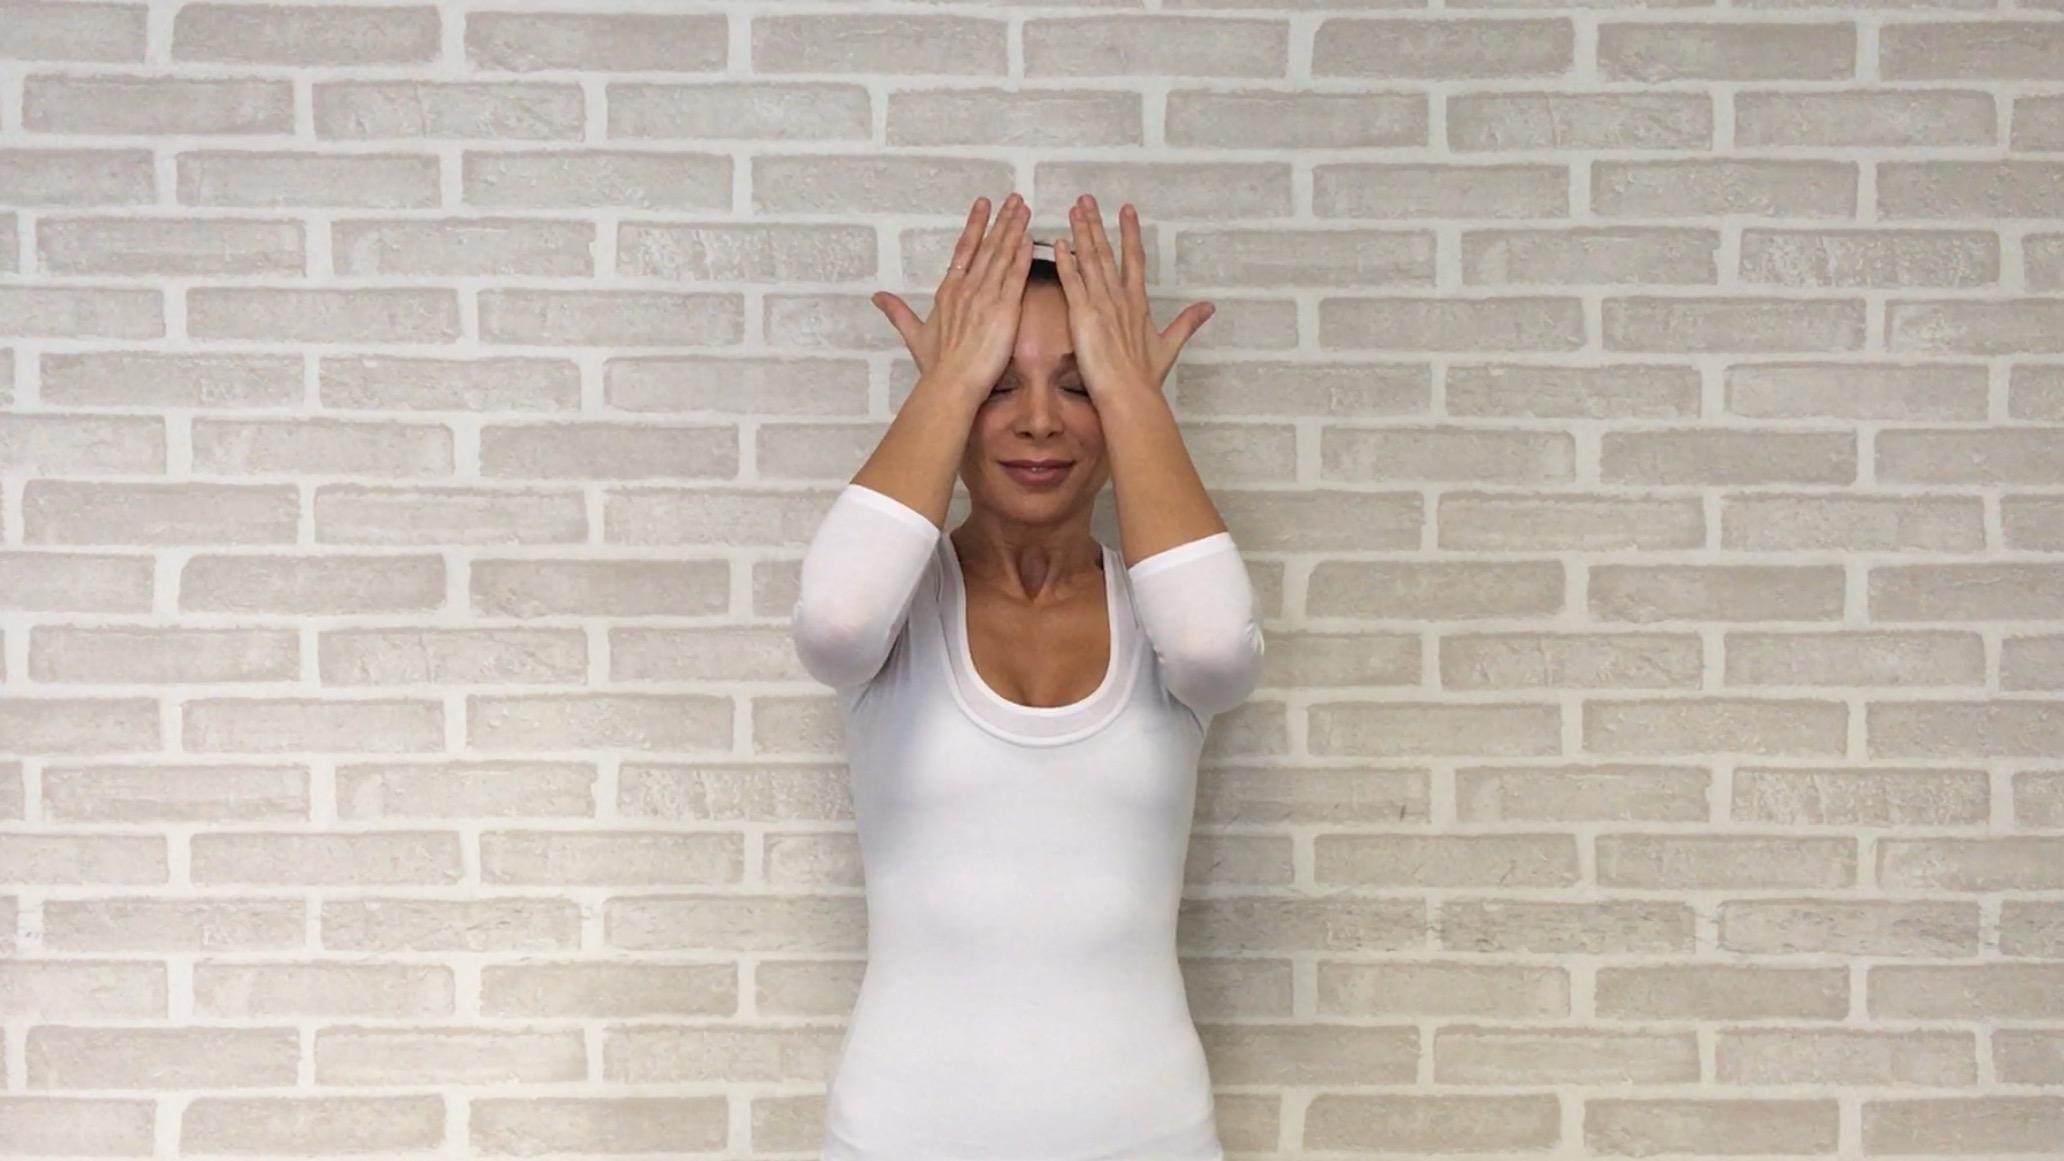 sebnem surucu - yuz yogasi 6